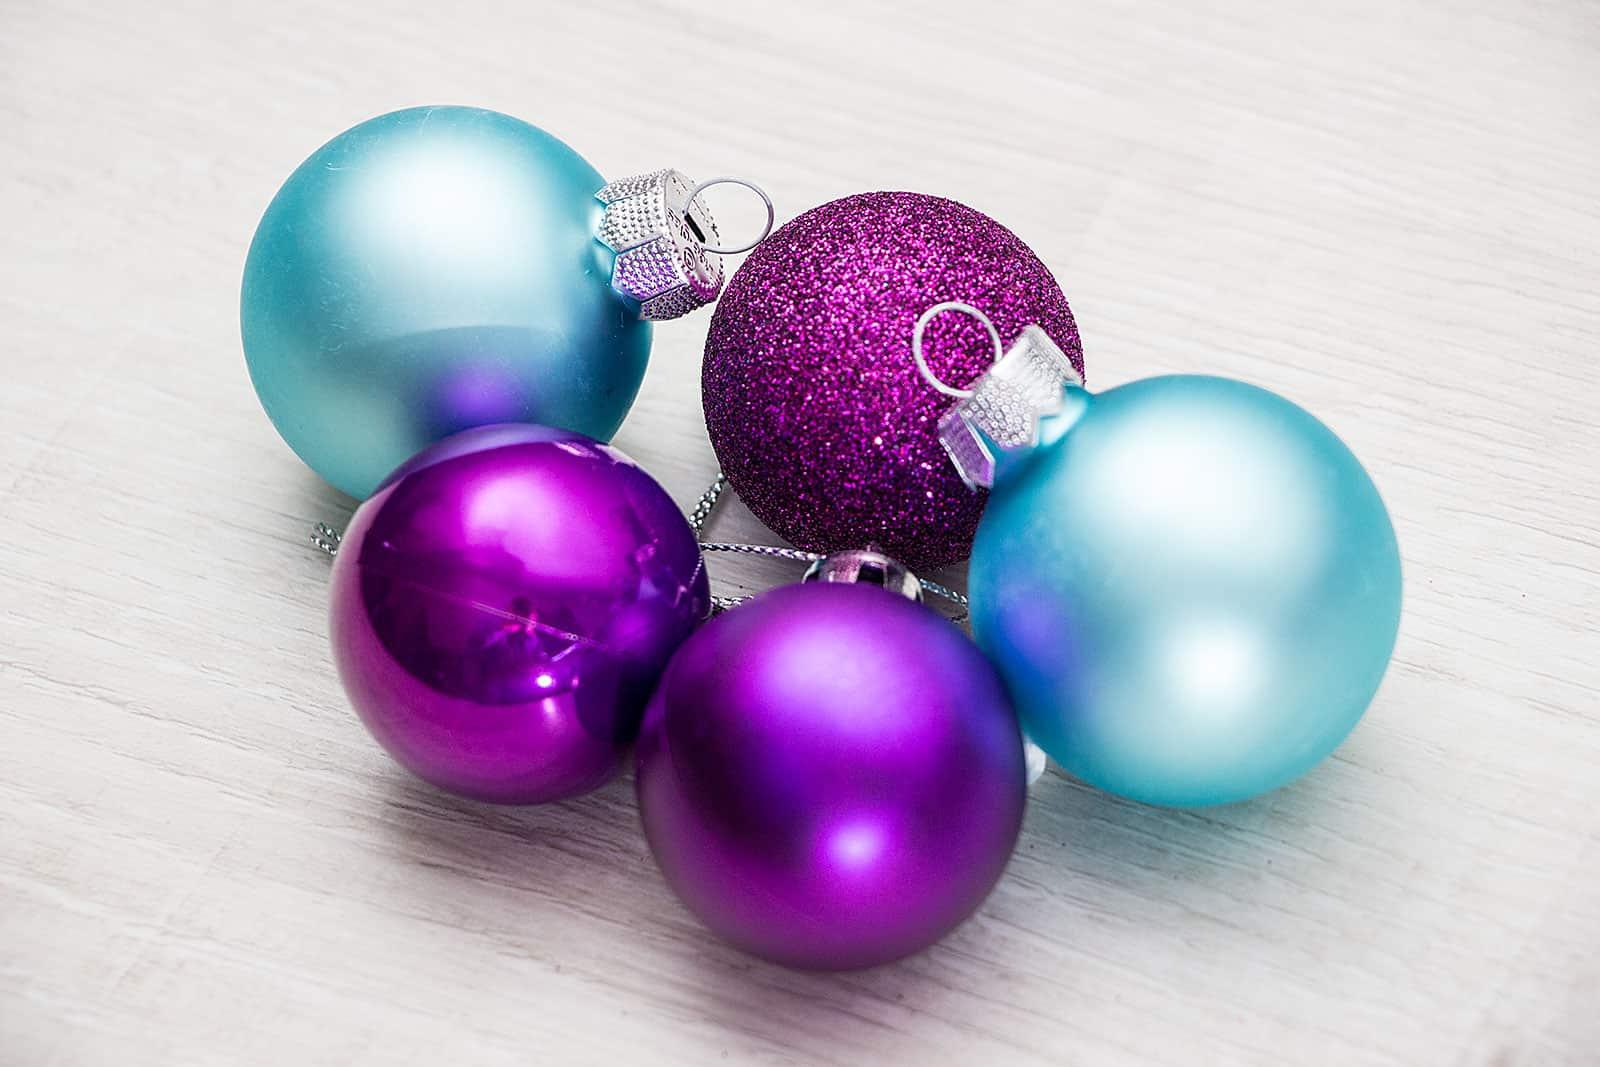 Christbaumkugeln Lila Kunststoff.Weihnachtskugeln Lila Geschmackvoller Weihnachtsschmuck